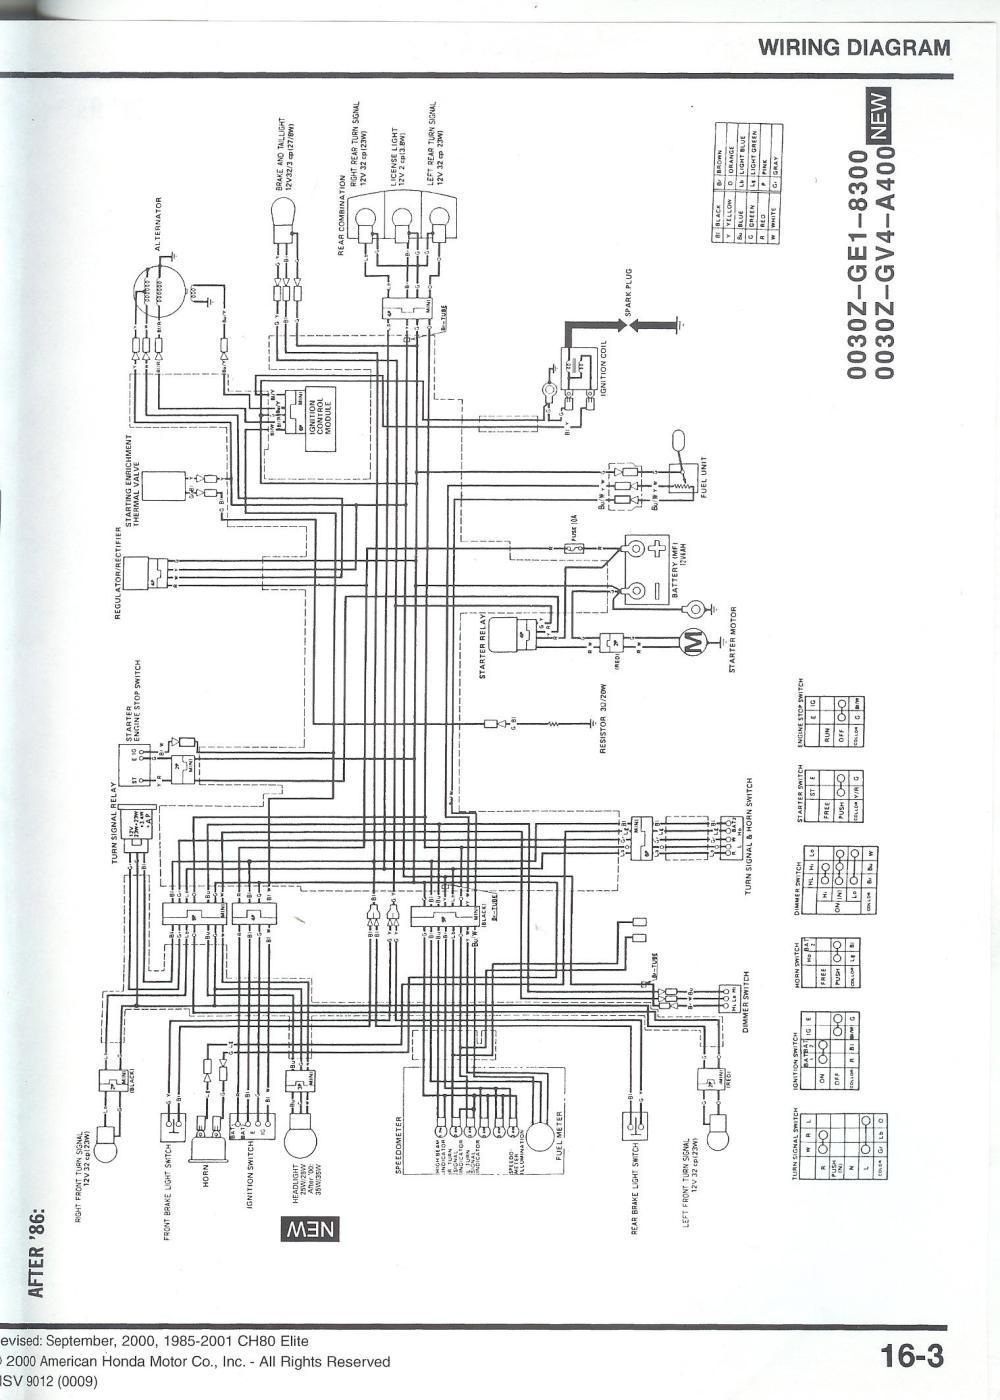 medium resolution of free honda scooter wiring diagram wiring diagram blogfree honda scooter wiring diagram wiring library vespa wiring